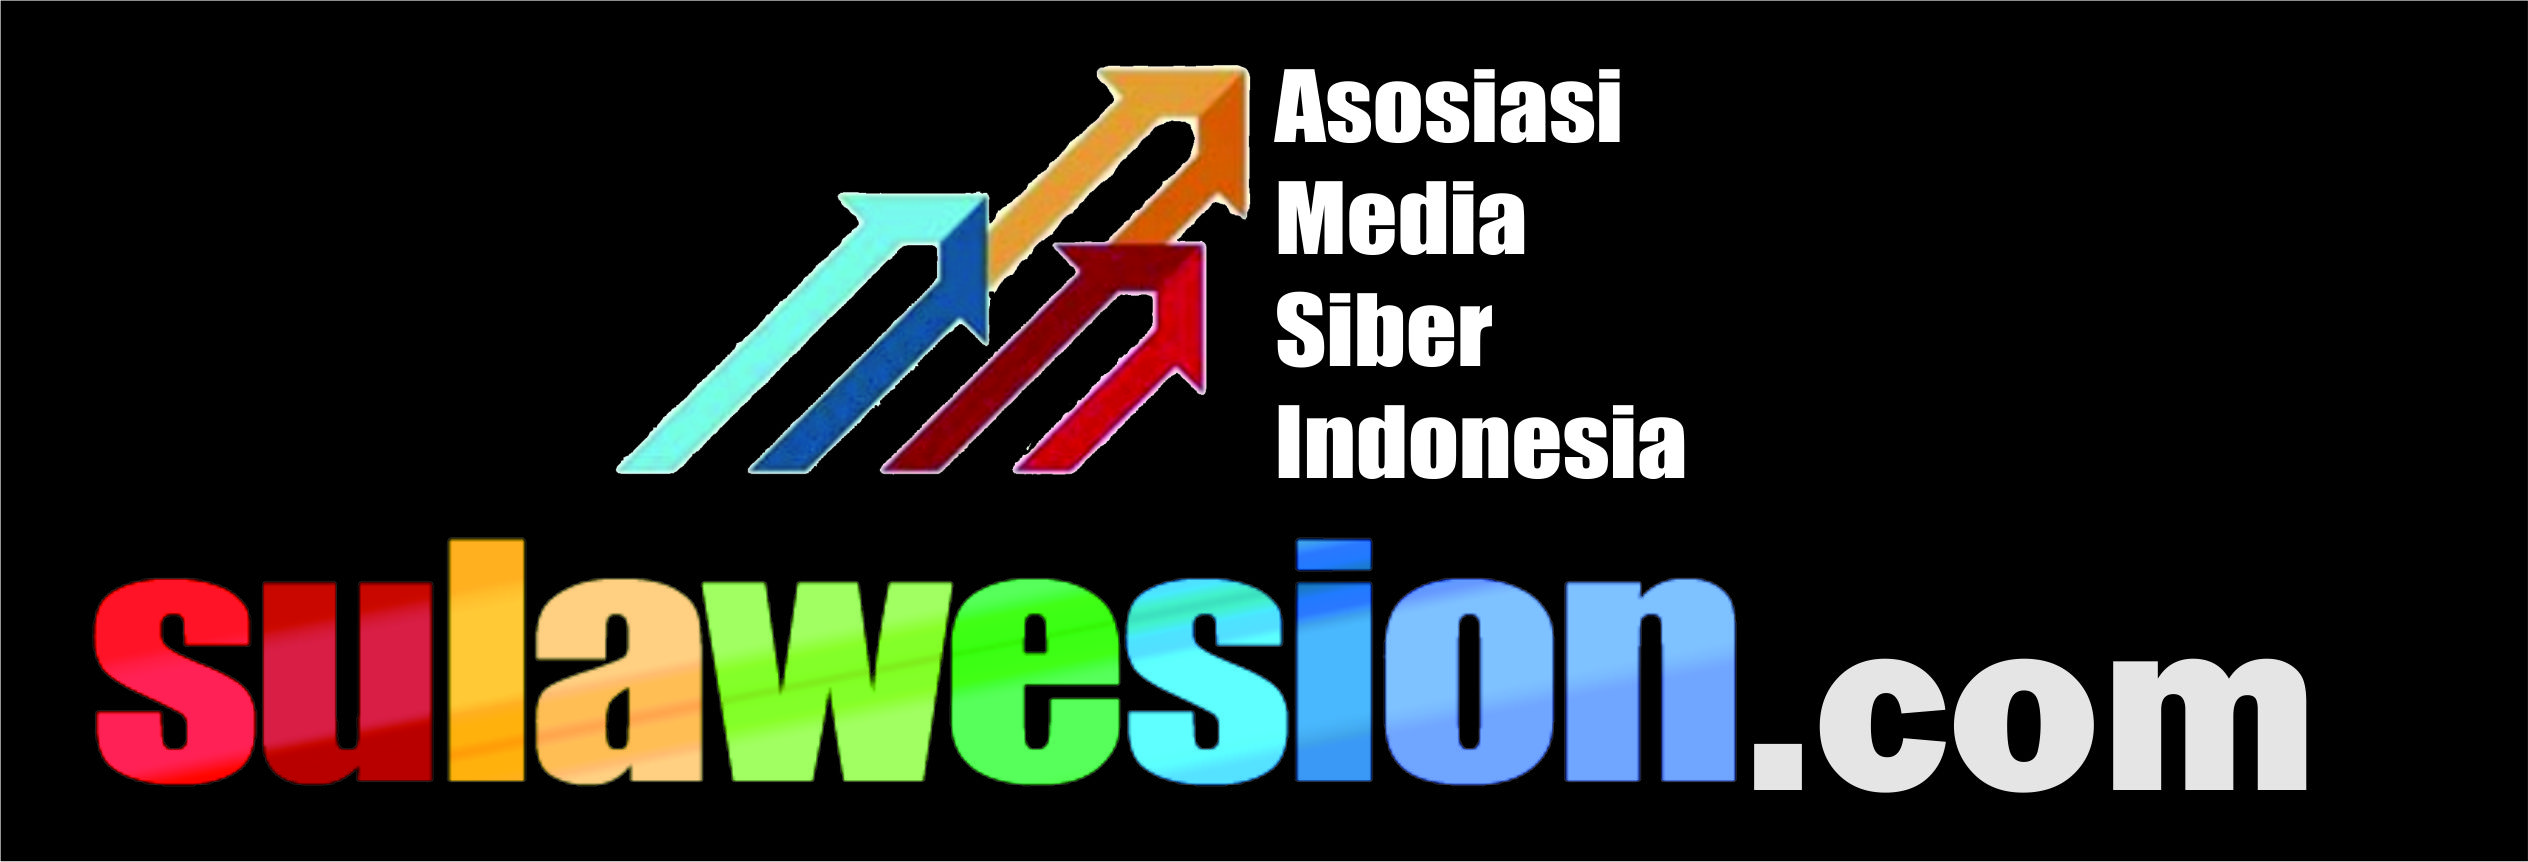 SULAWESION.COM